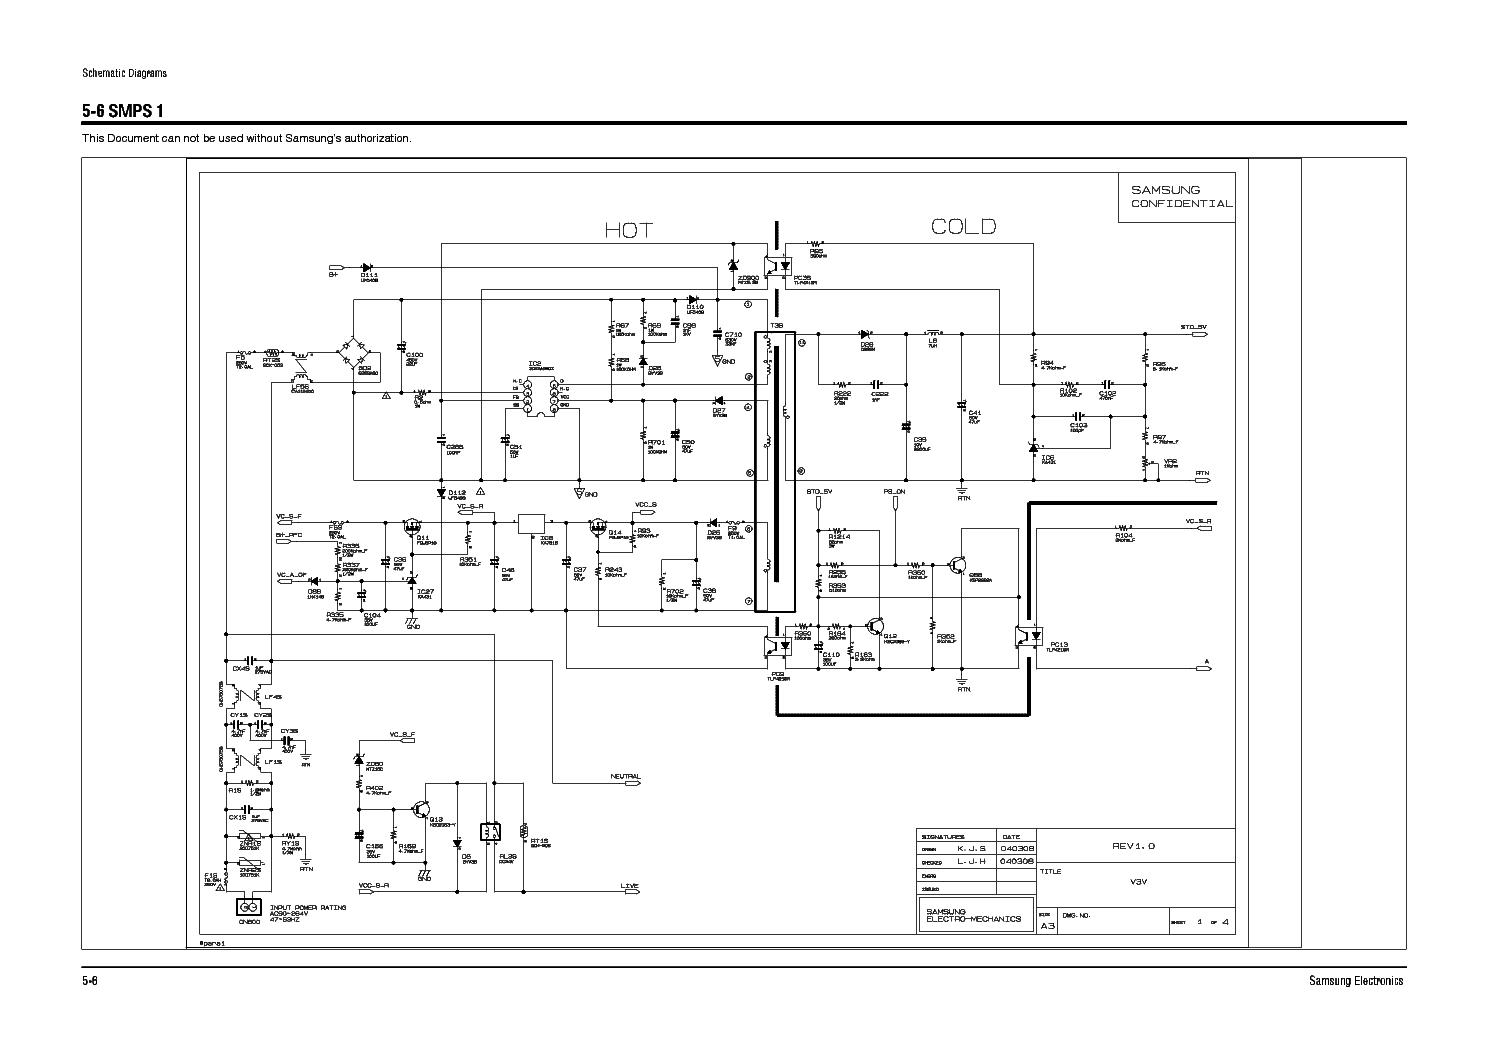 SAMSUNG BN44-00217A REV.1.0 PWR SCH Service Manual